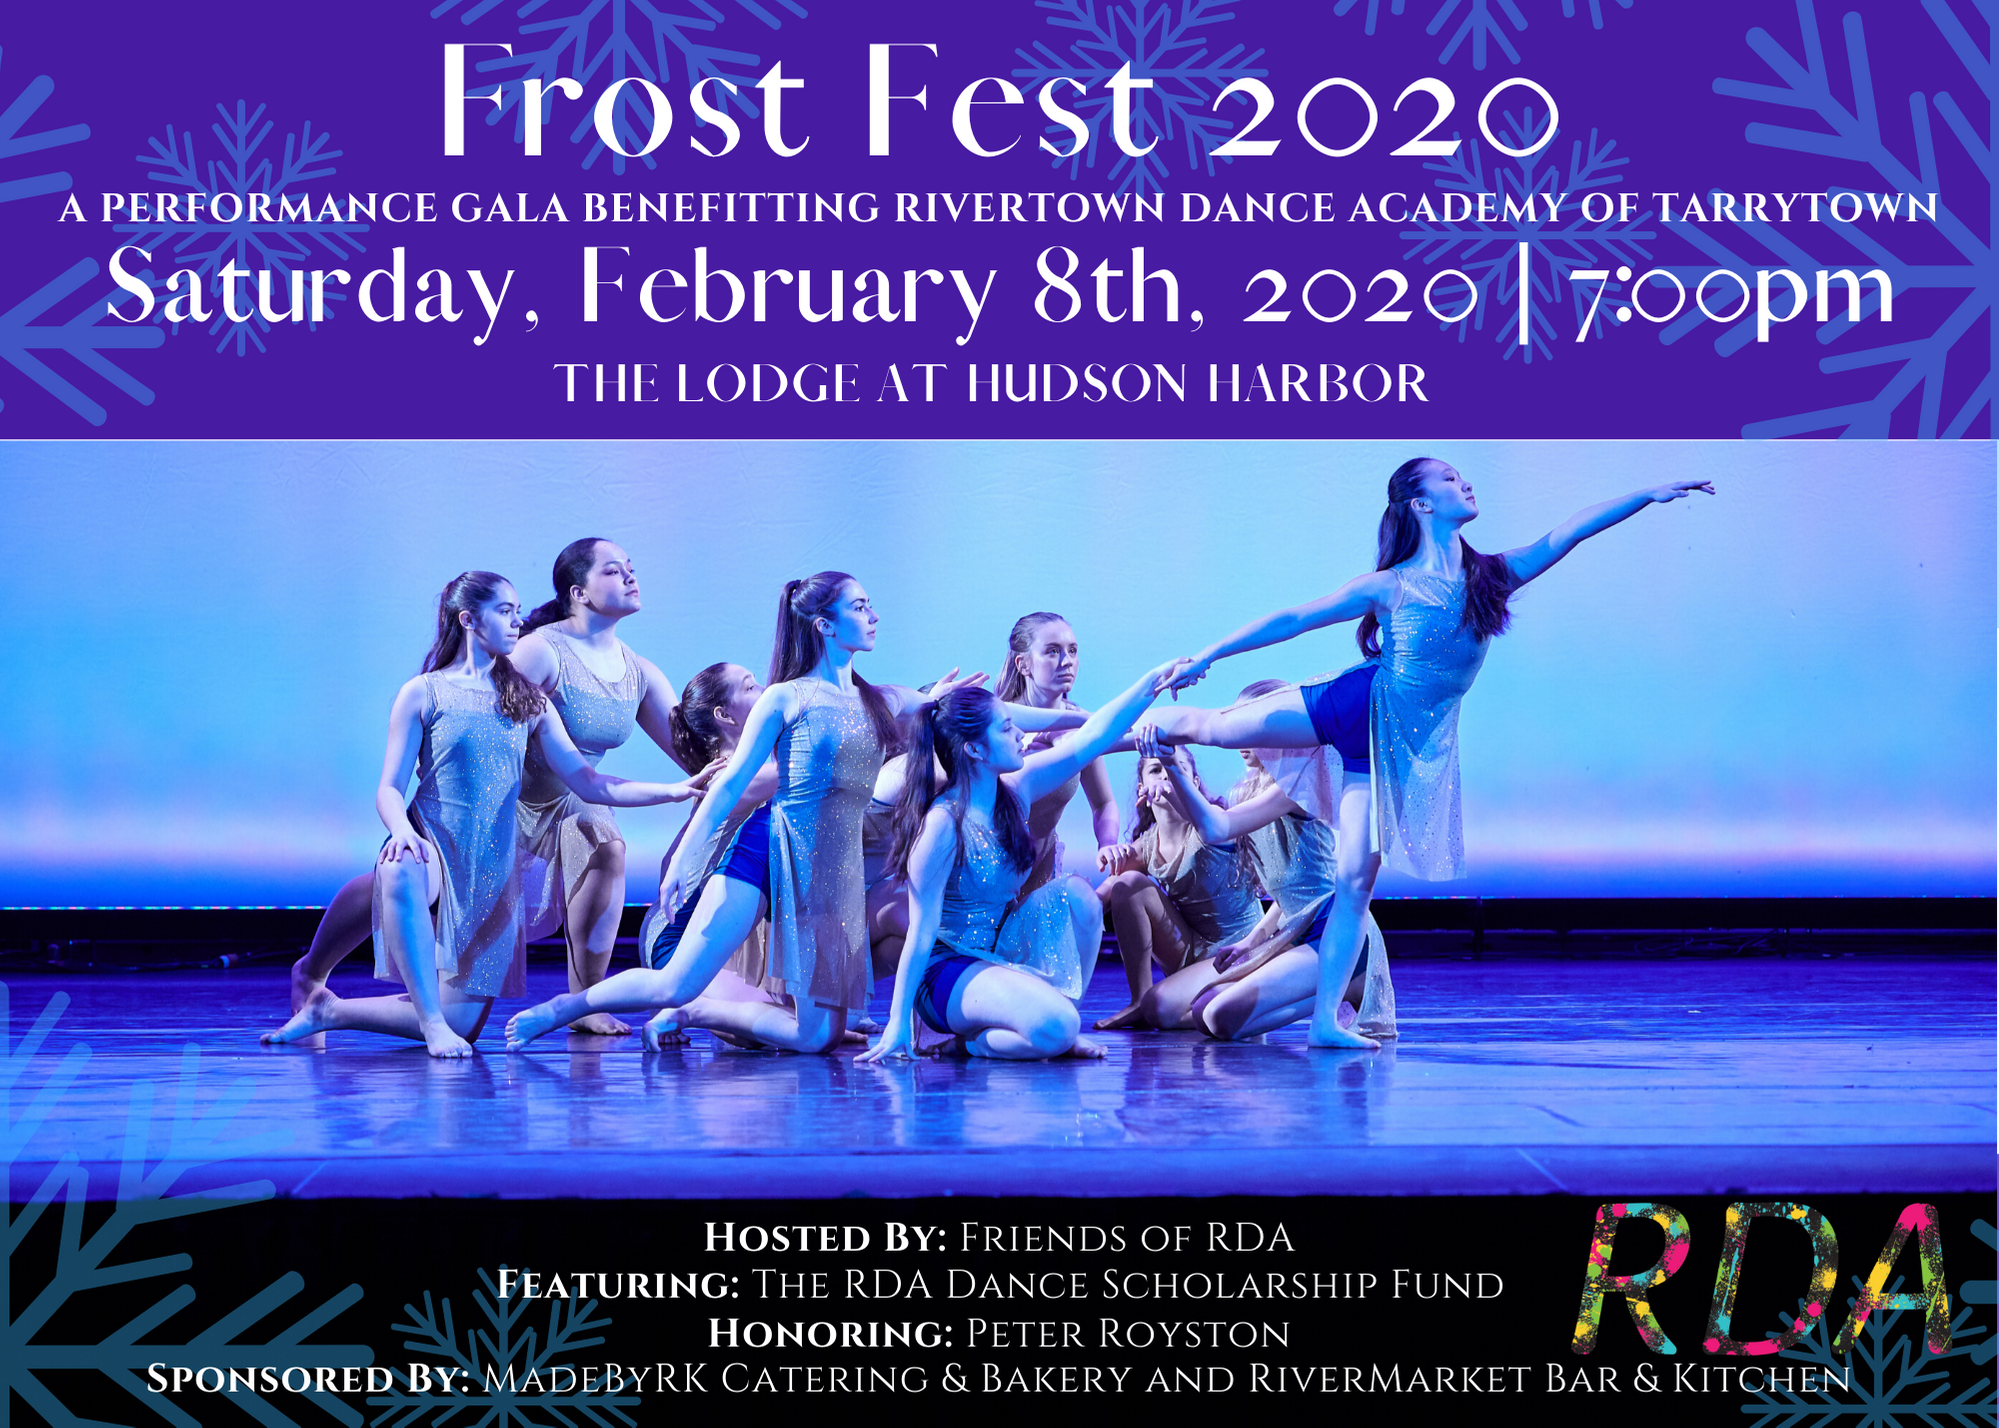 Frost Fest 2020